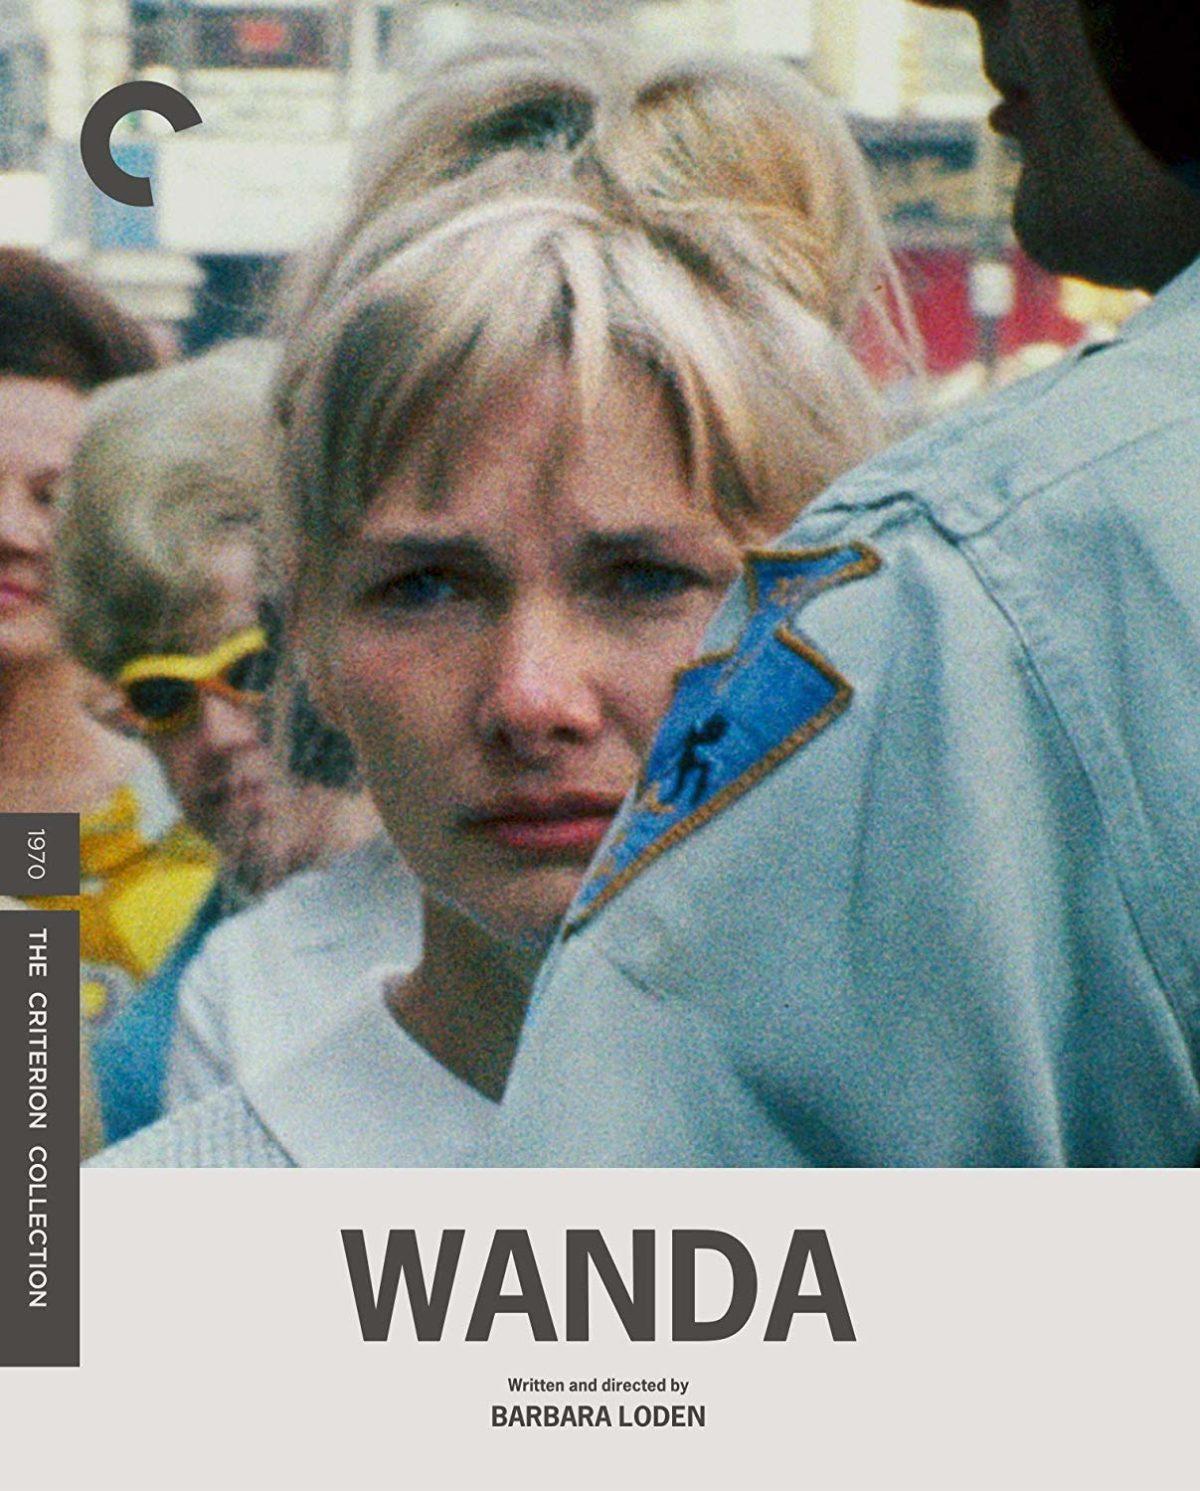 Mike's Picks: 'Wanda' and 'Phantom Lady'